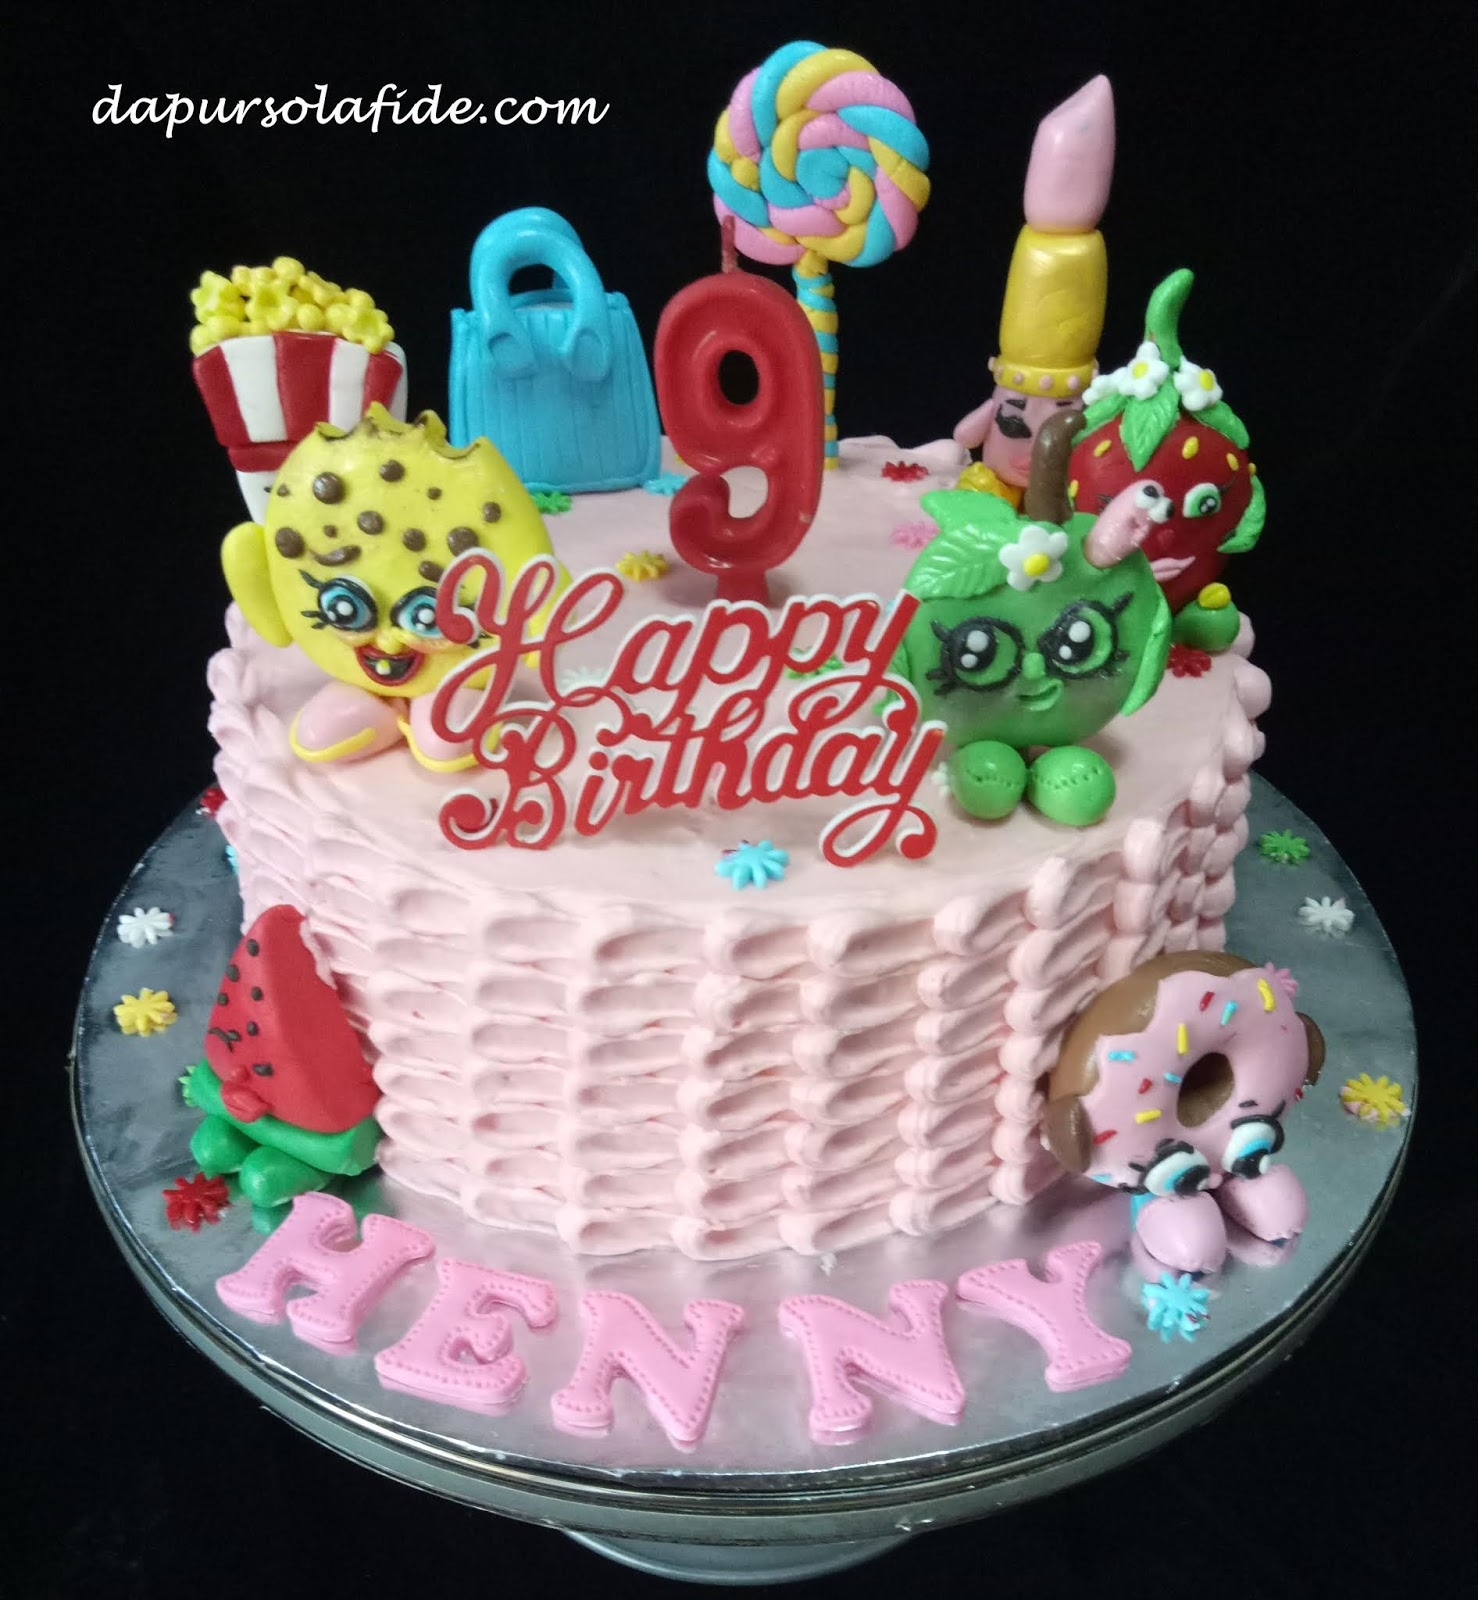 Dapur Solafide The Enchanting Cakes Shopkins Birthday Cake